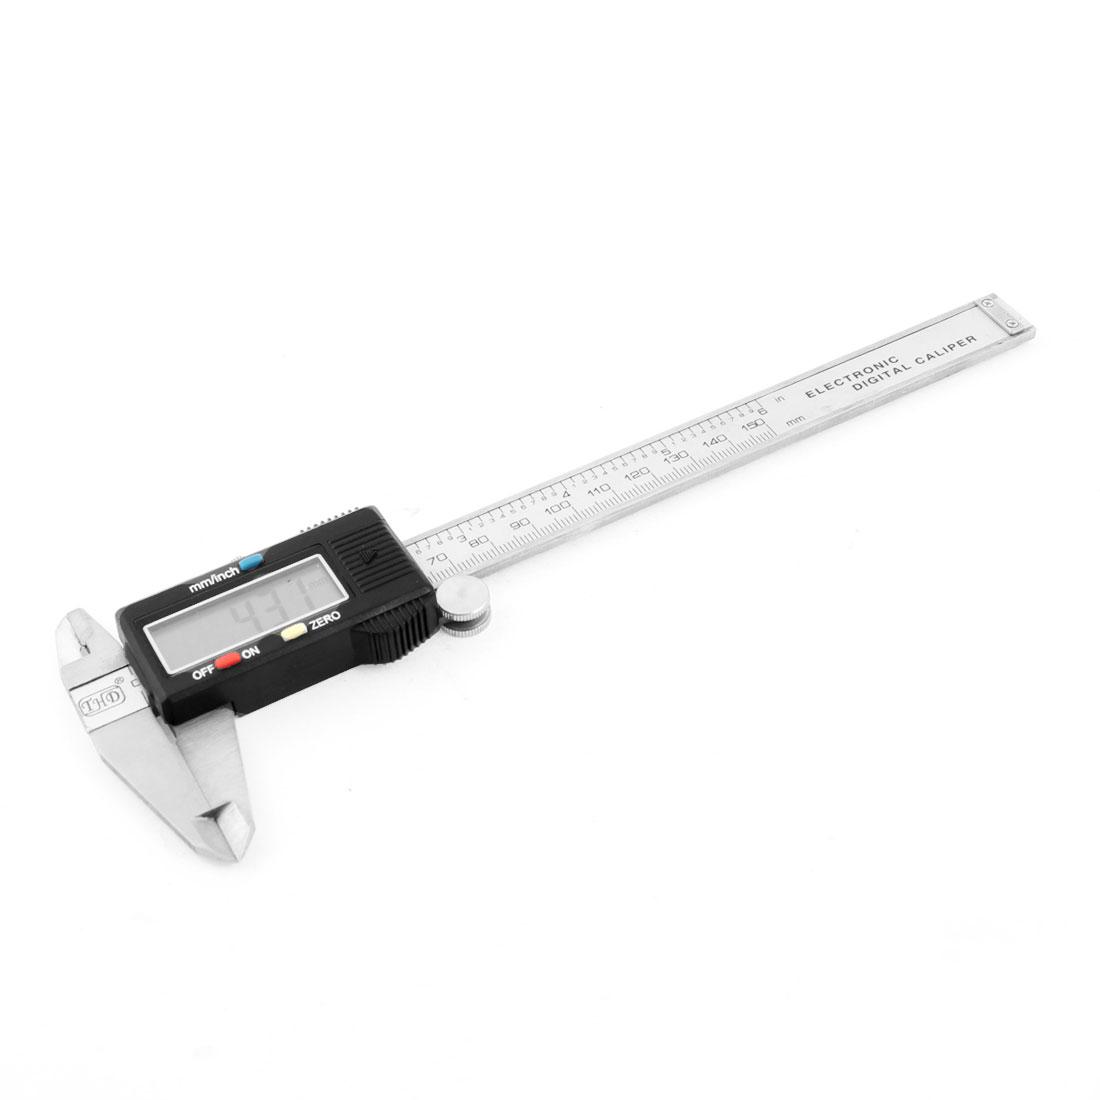 "0-150mm 6"" Range Digital Vernier Caliper Micrometer Guage w Case"